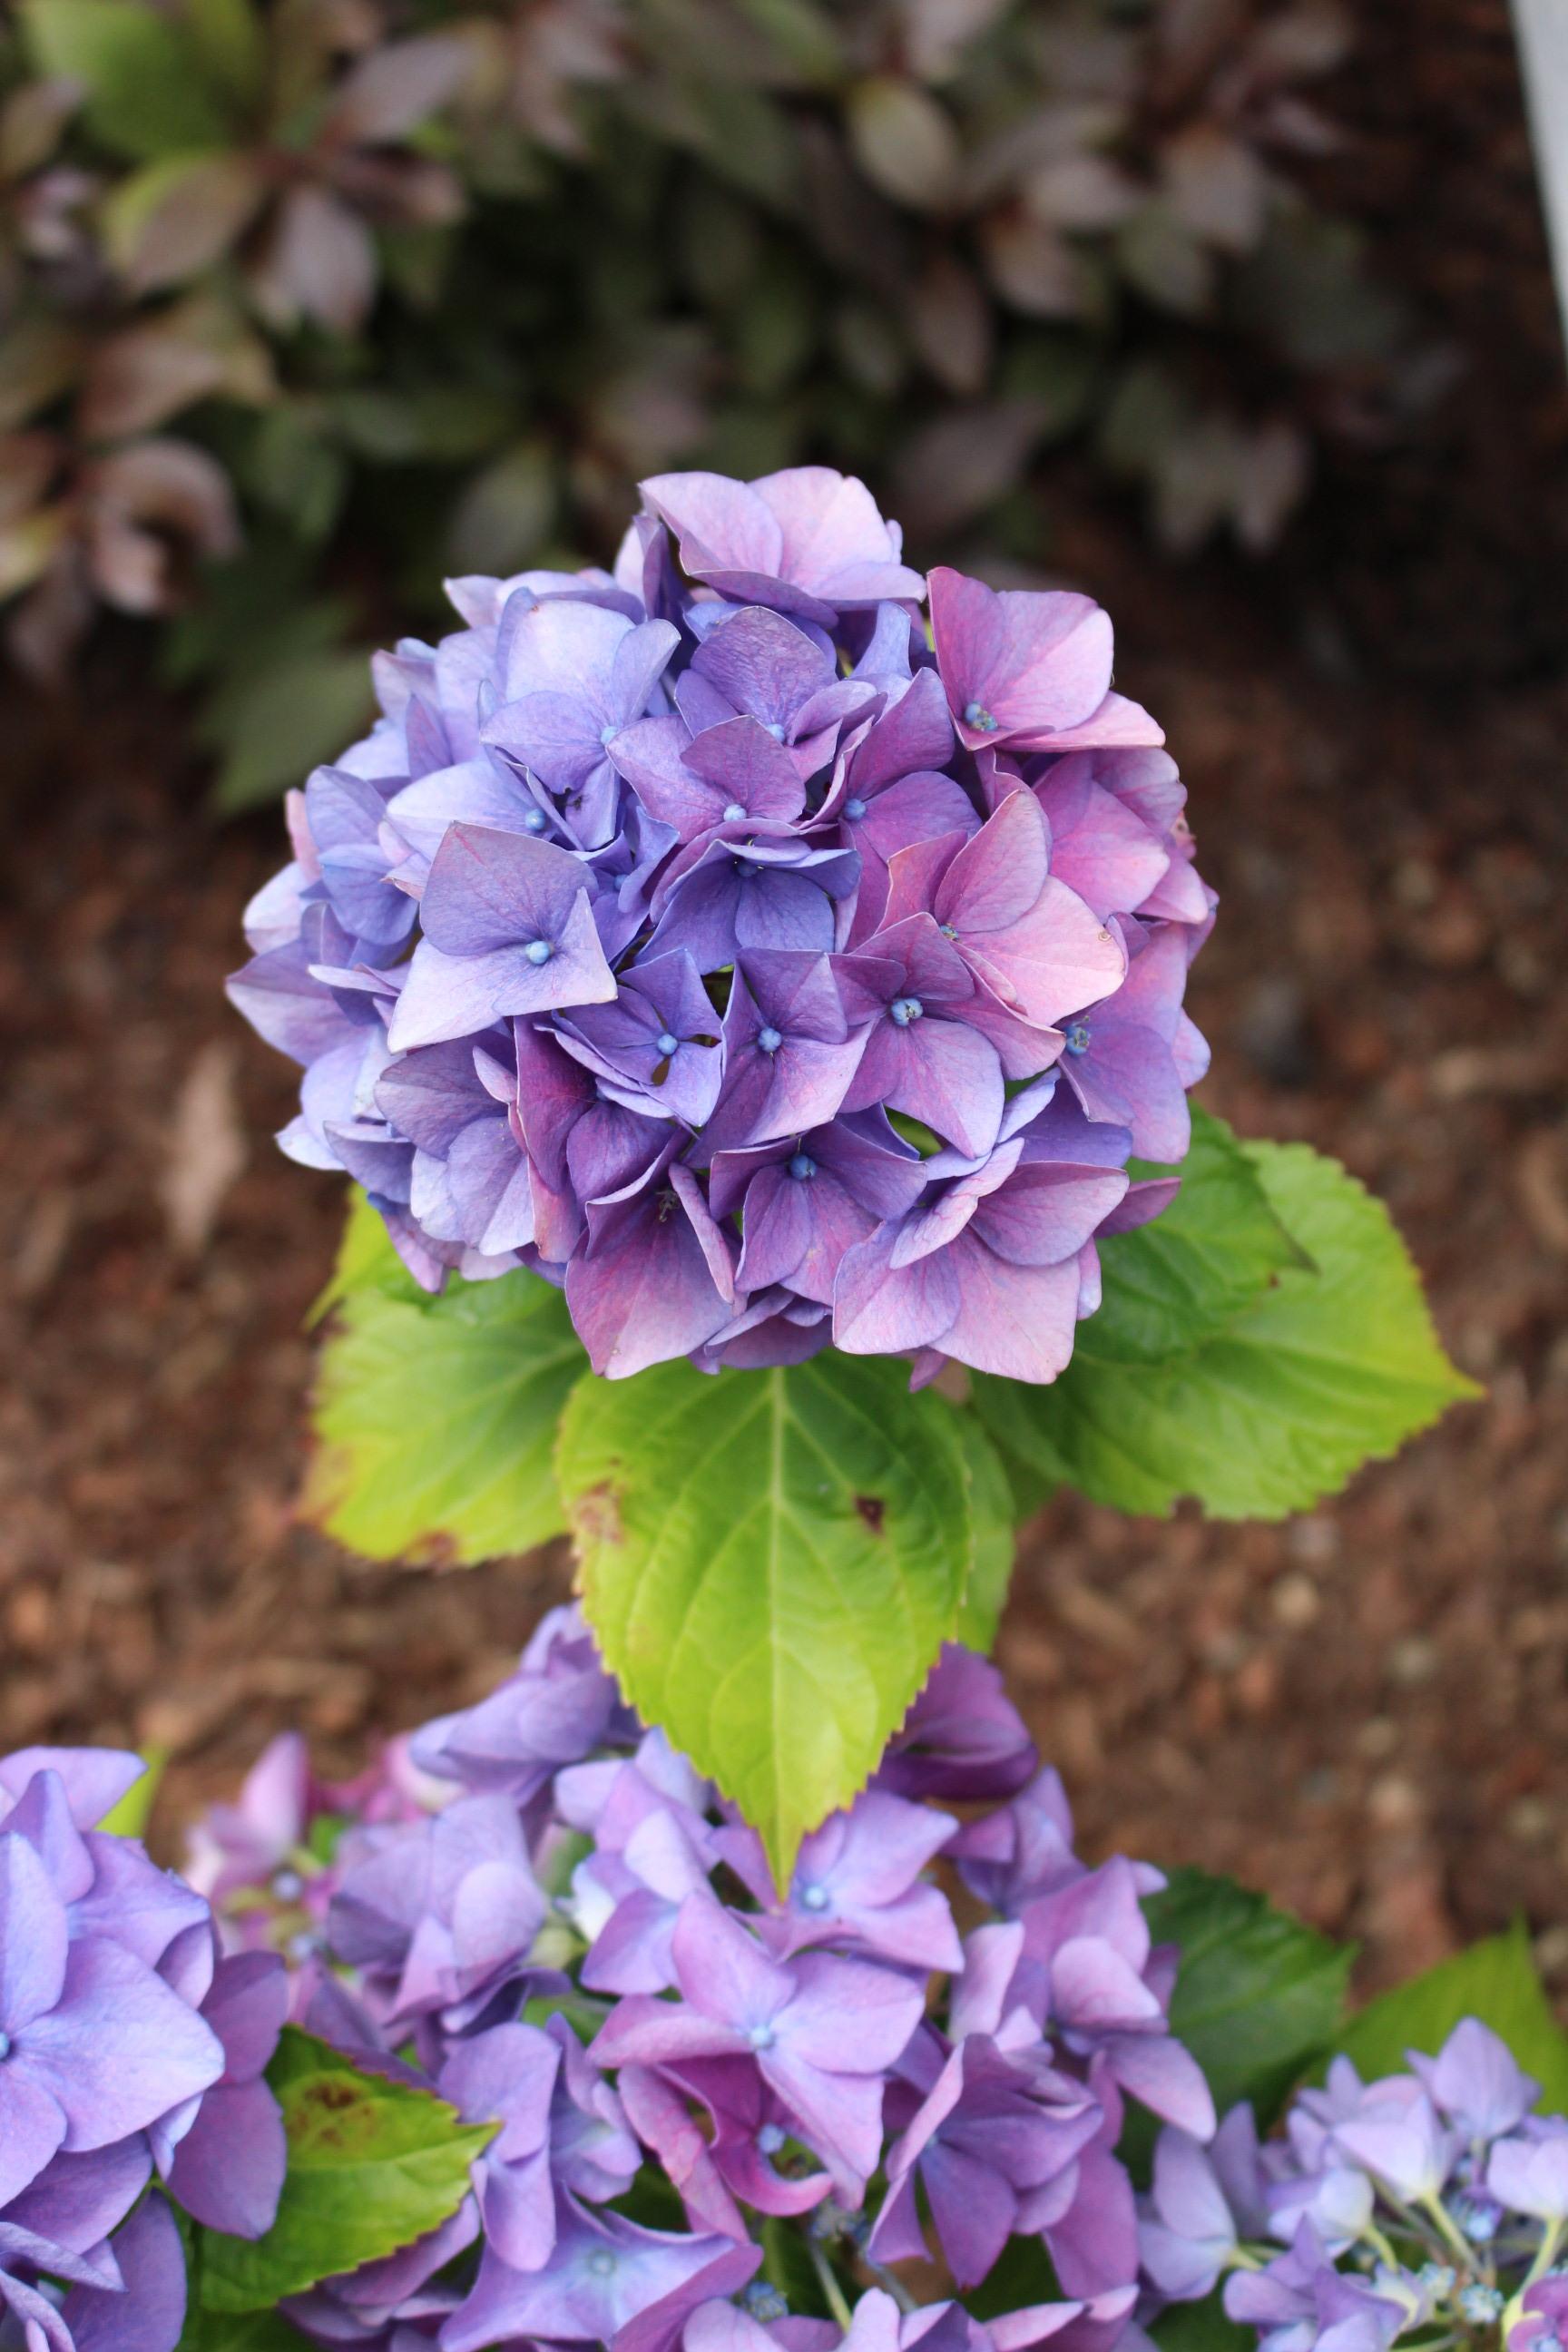 #17 Hydrangea, Hydrangea macrophylla